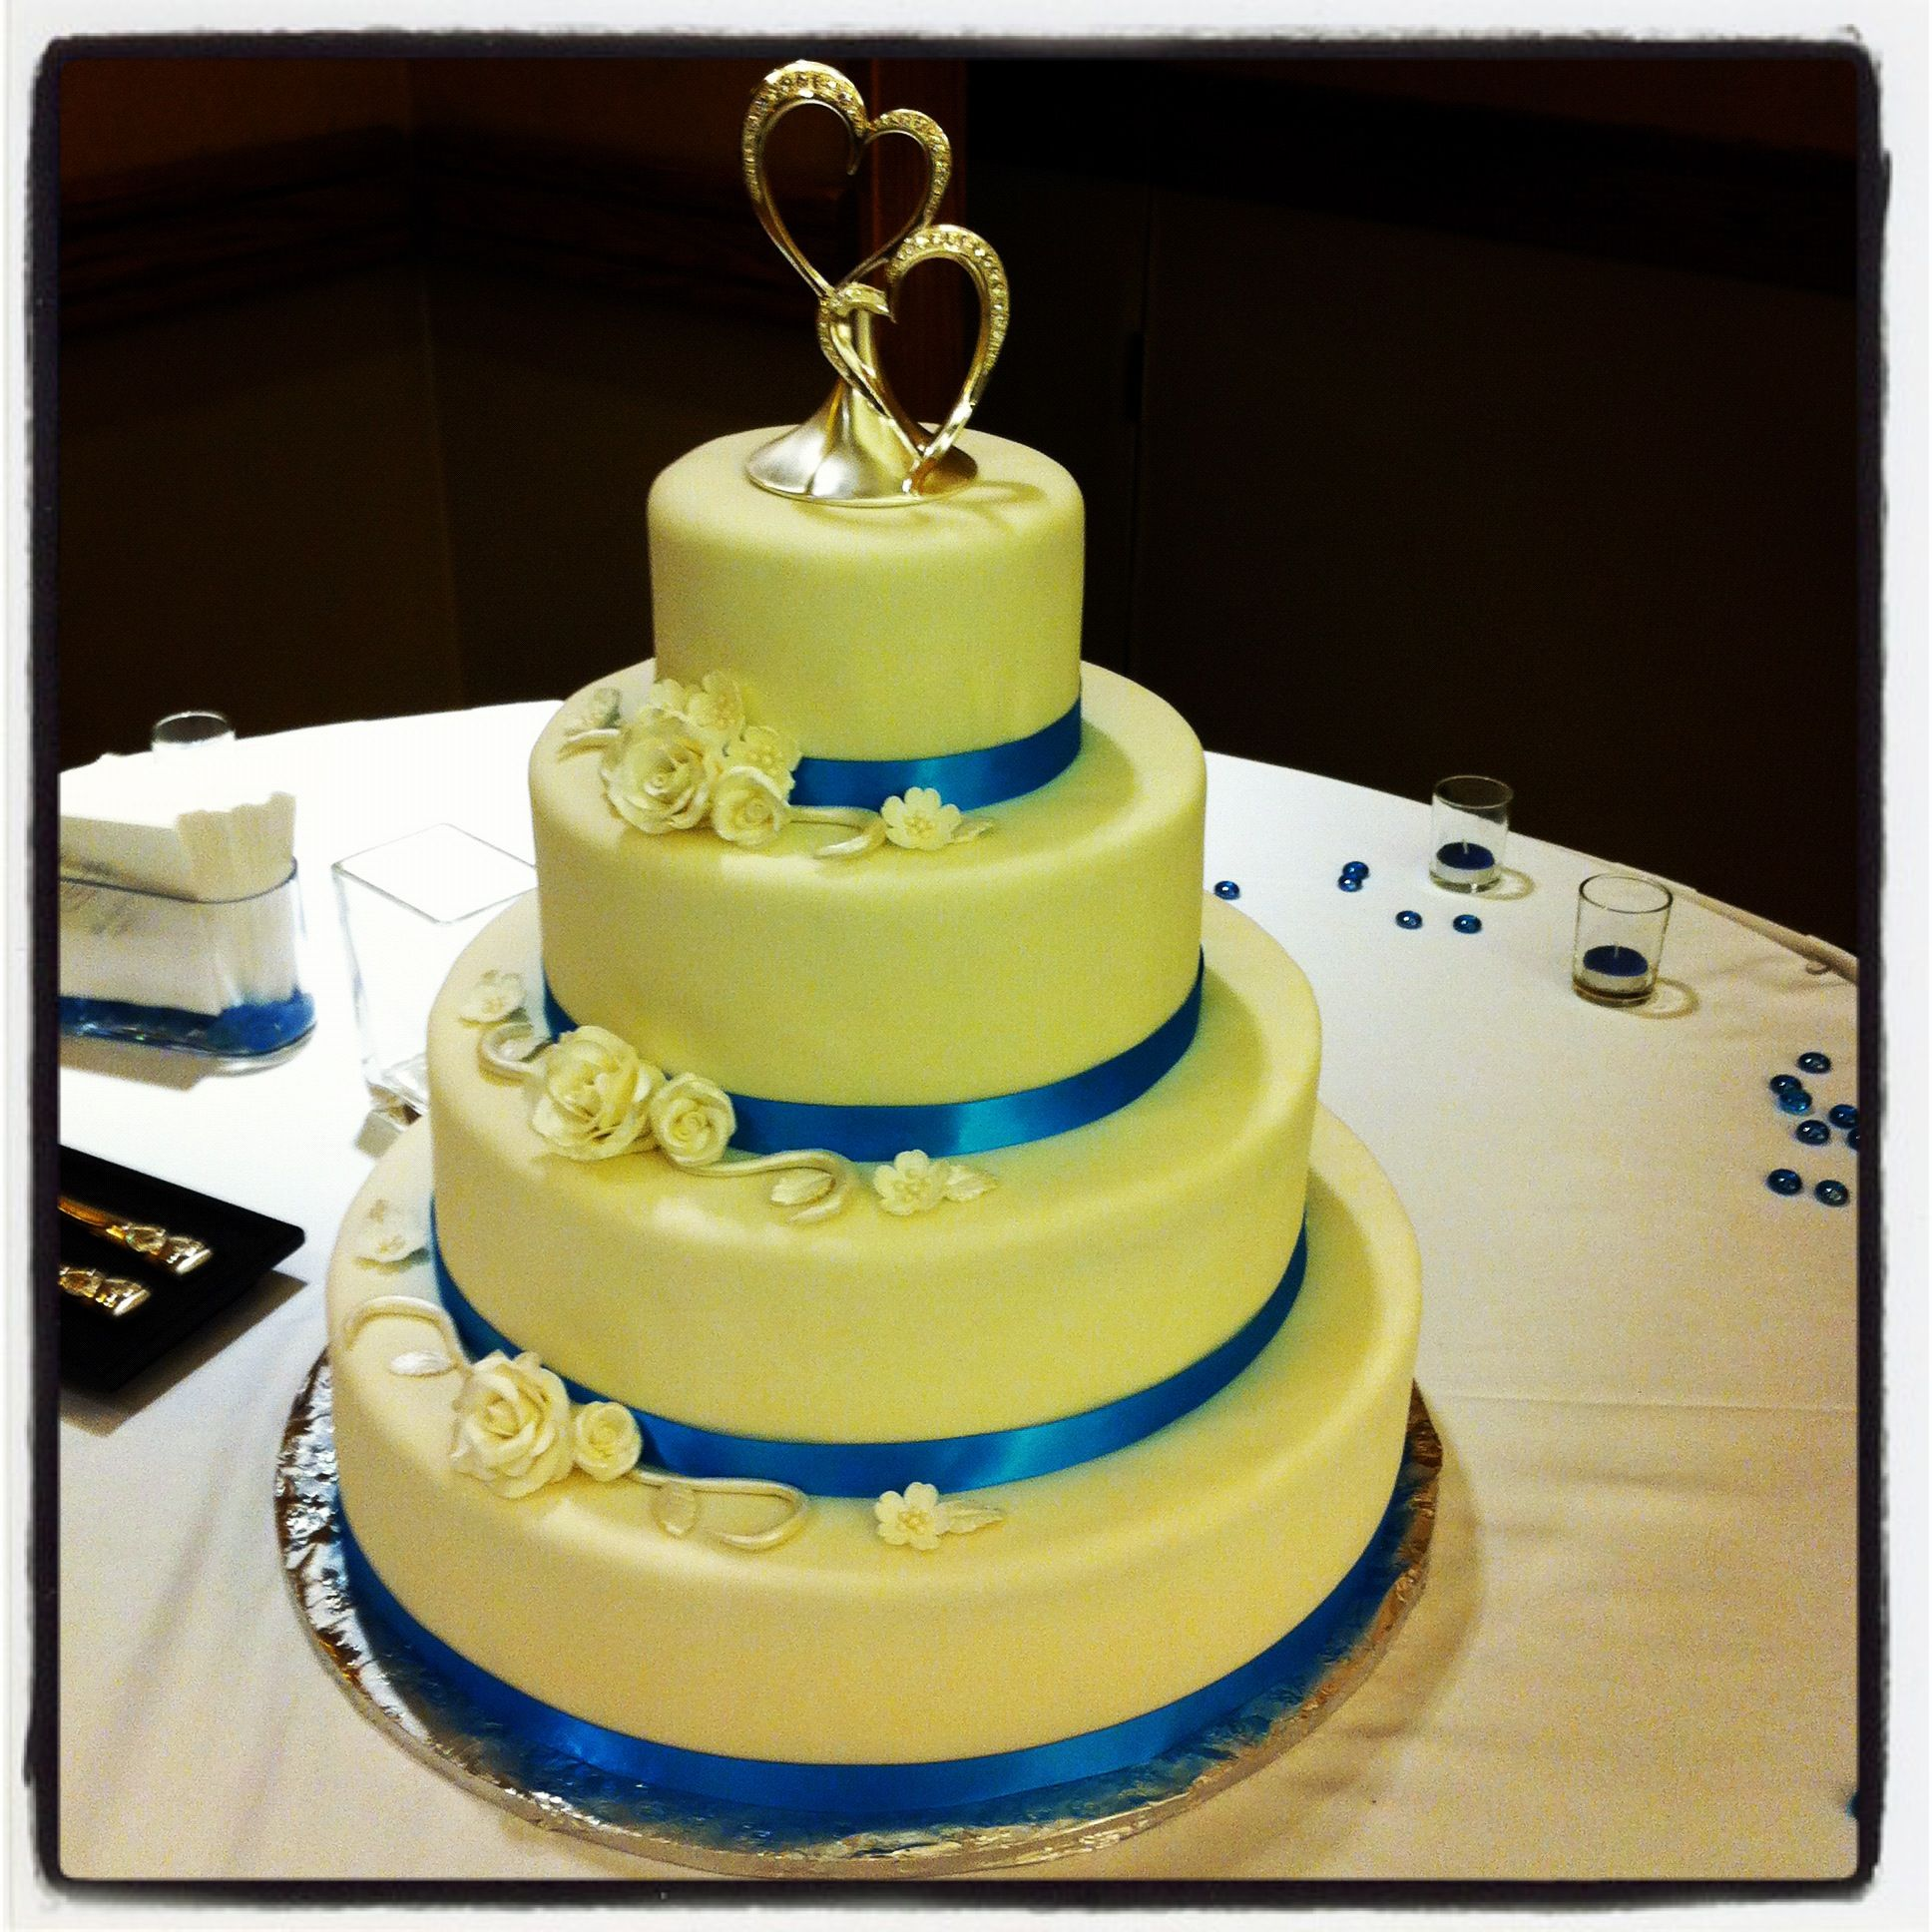 4 Tier Wedding Cake (18\